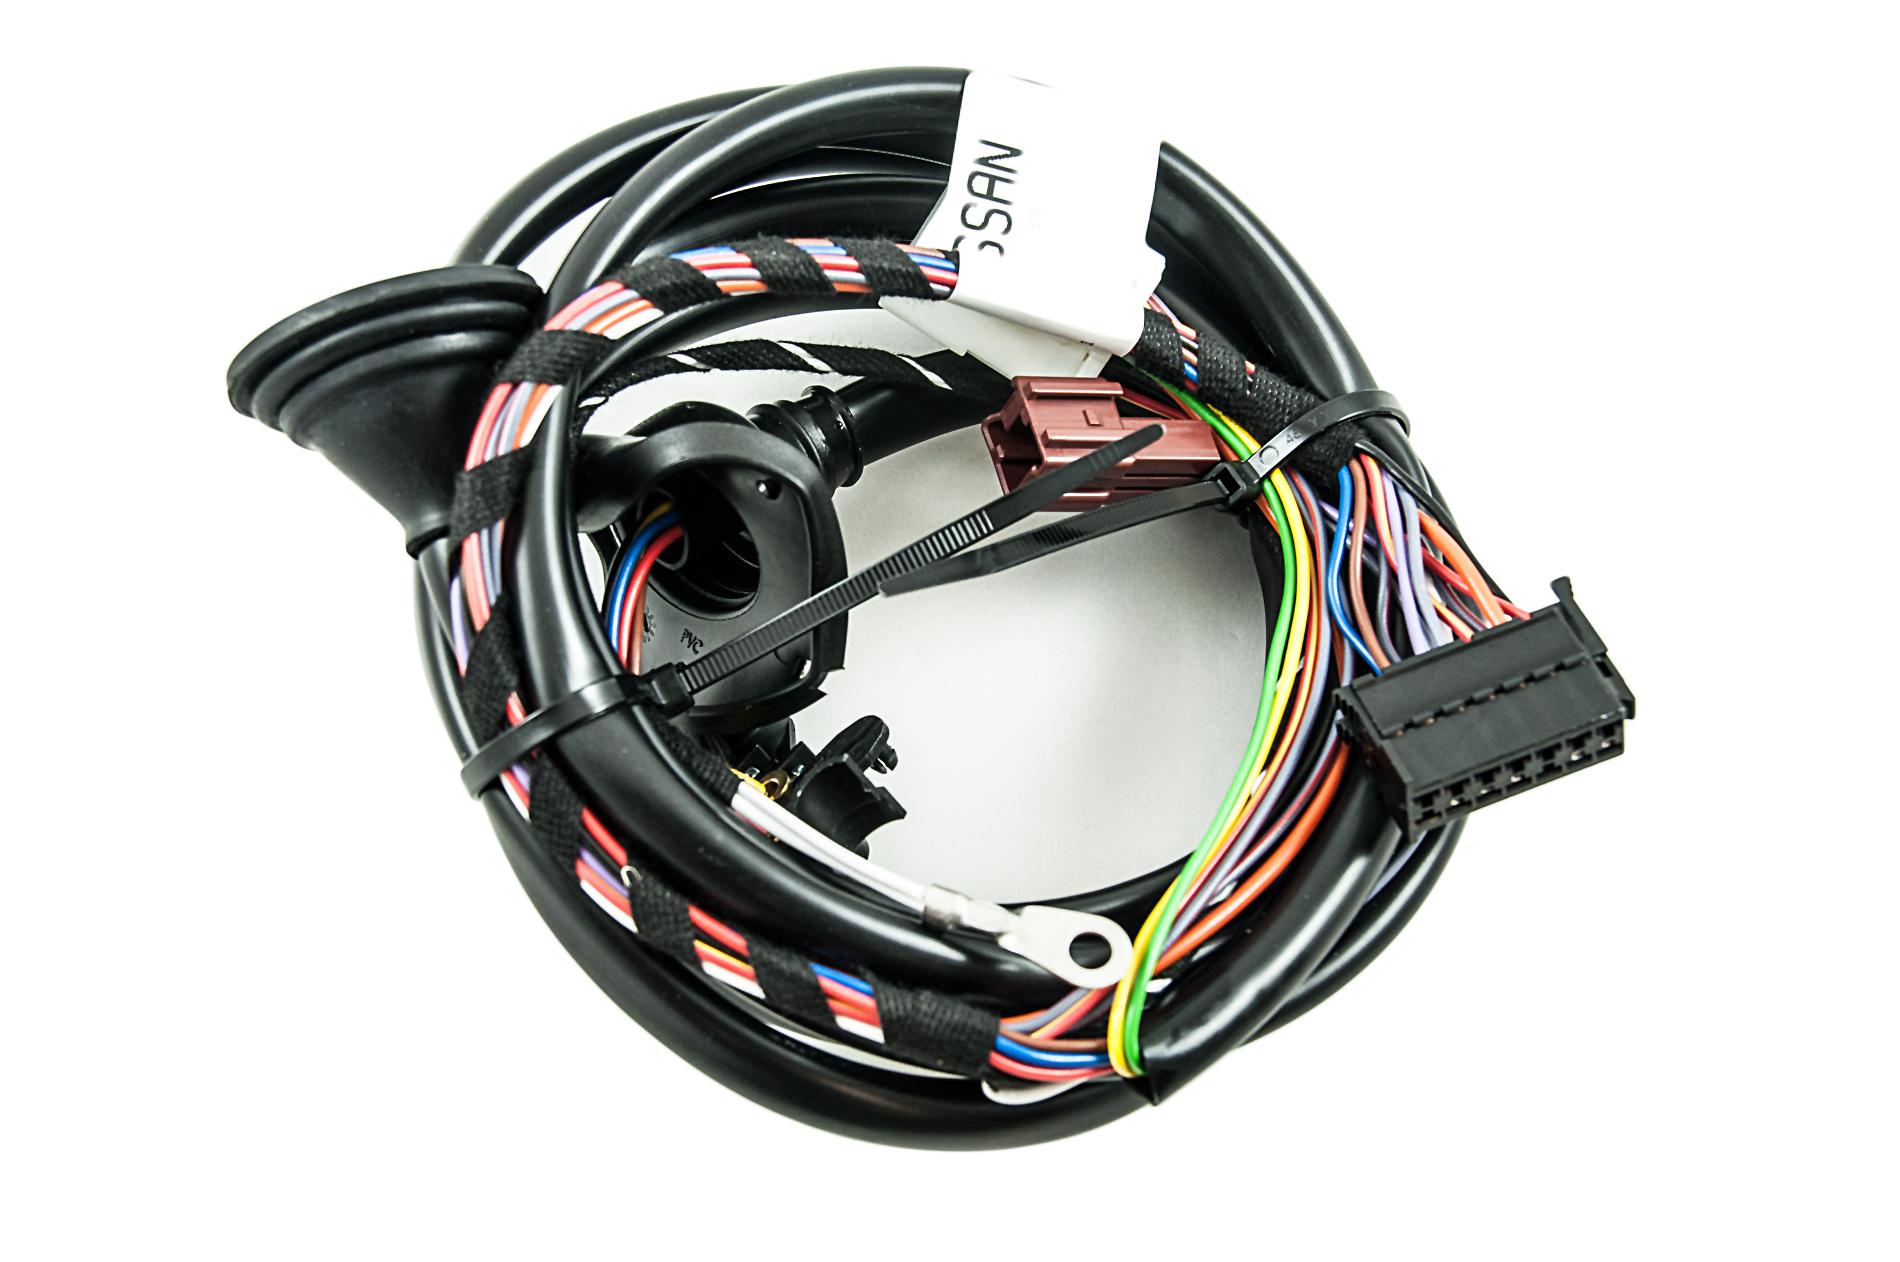 KE5054C007_20a nissan genuine new x trail t32 tow bar electrics wiring kit tek 7